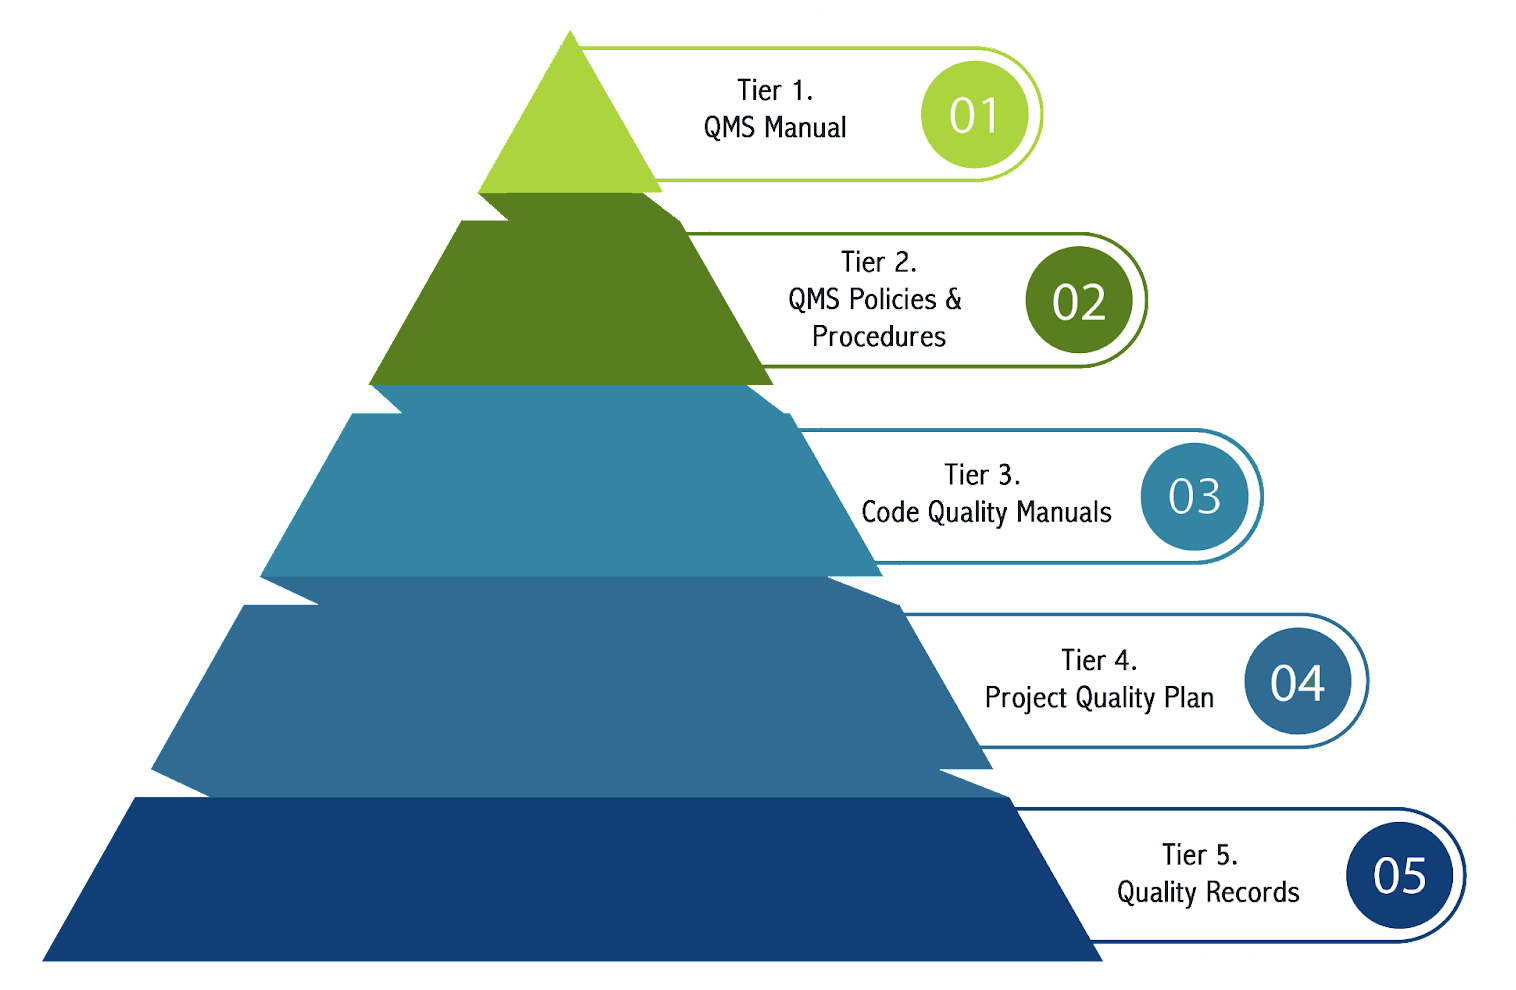 Construction quality management often involves utilizing Total Quality Management (TQM) practices.